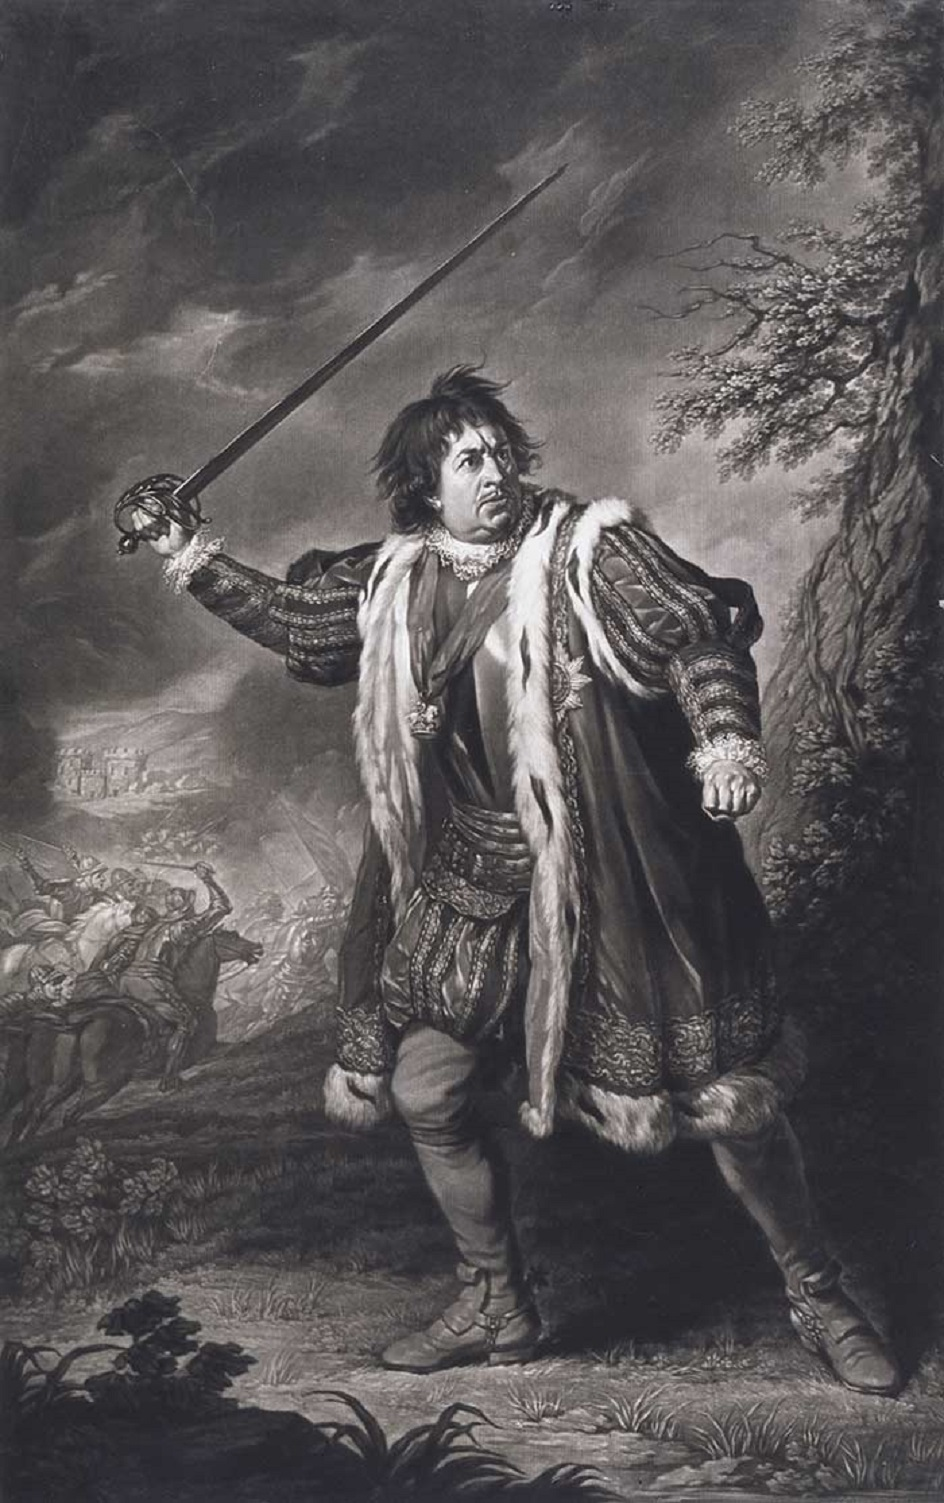 Меццо-тинто. Джон Диксон. Гравюра «Дэвид Гаррик в роли Ричарда III», 1772